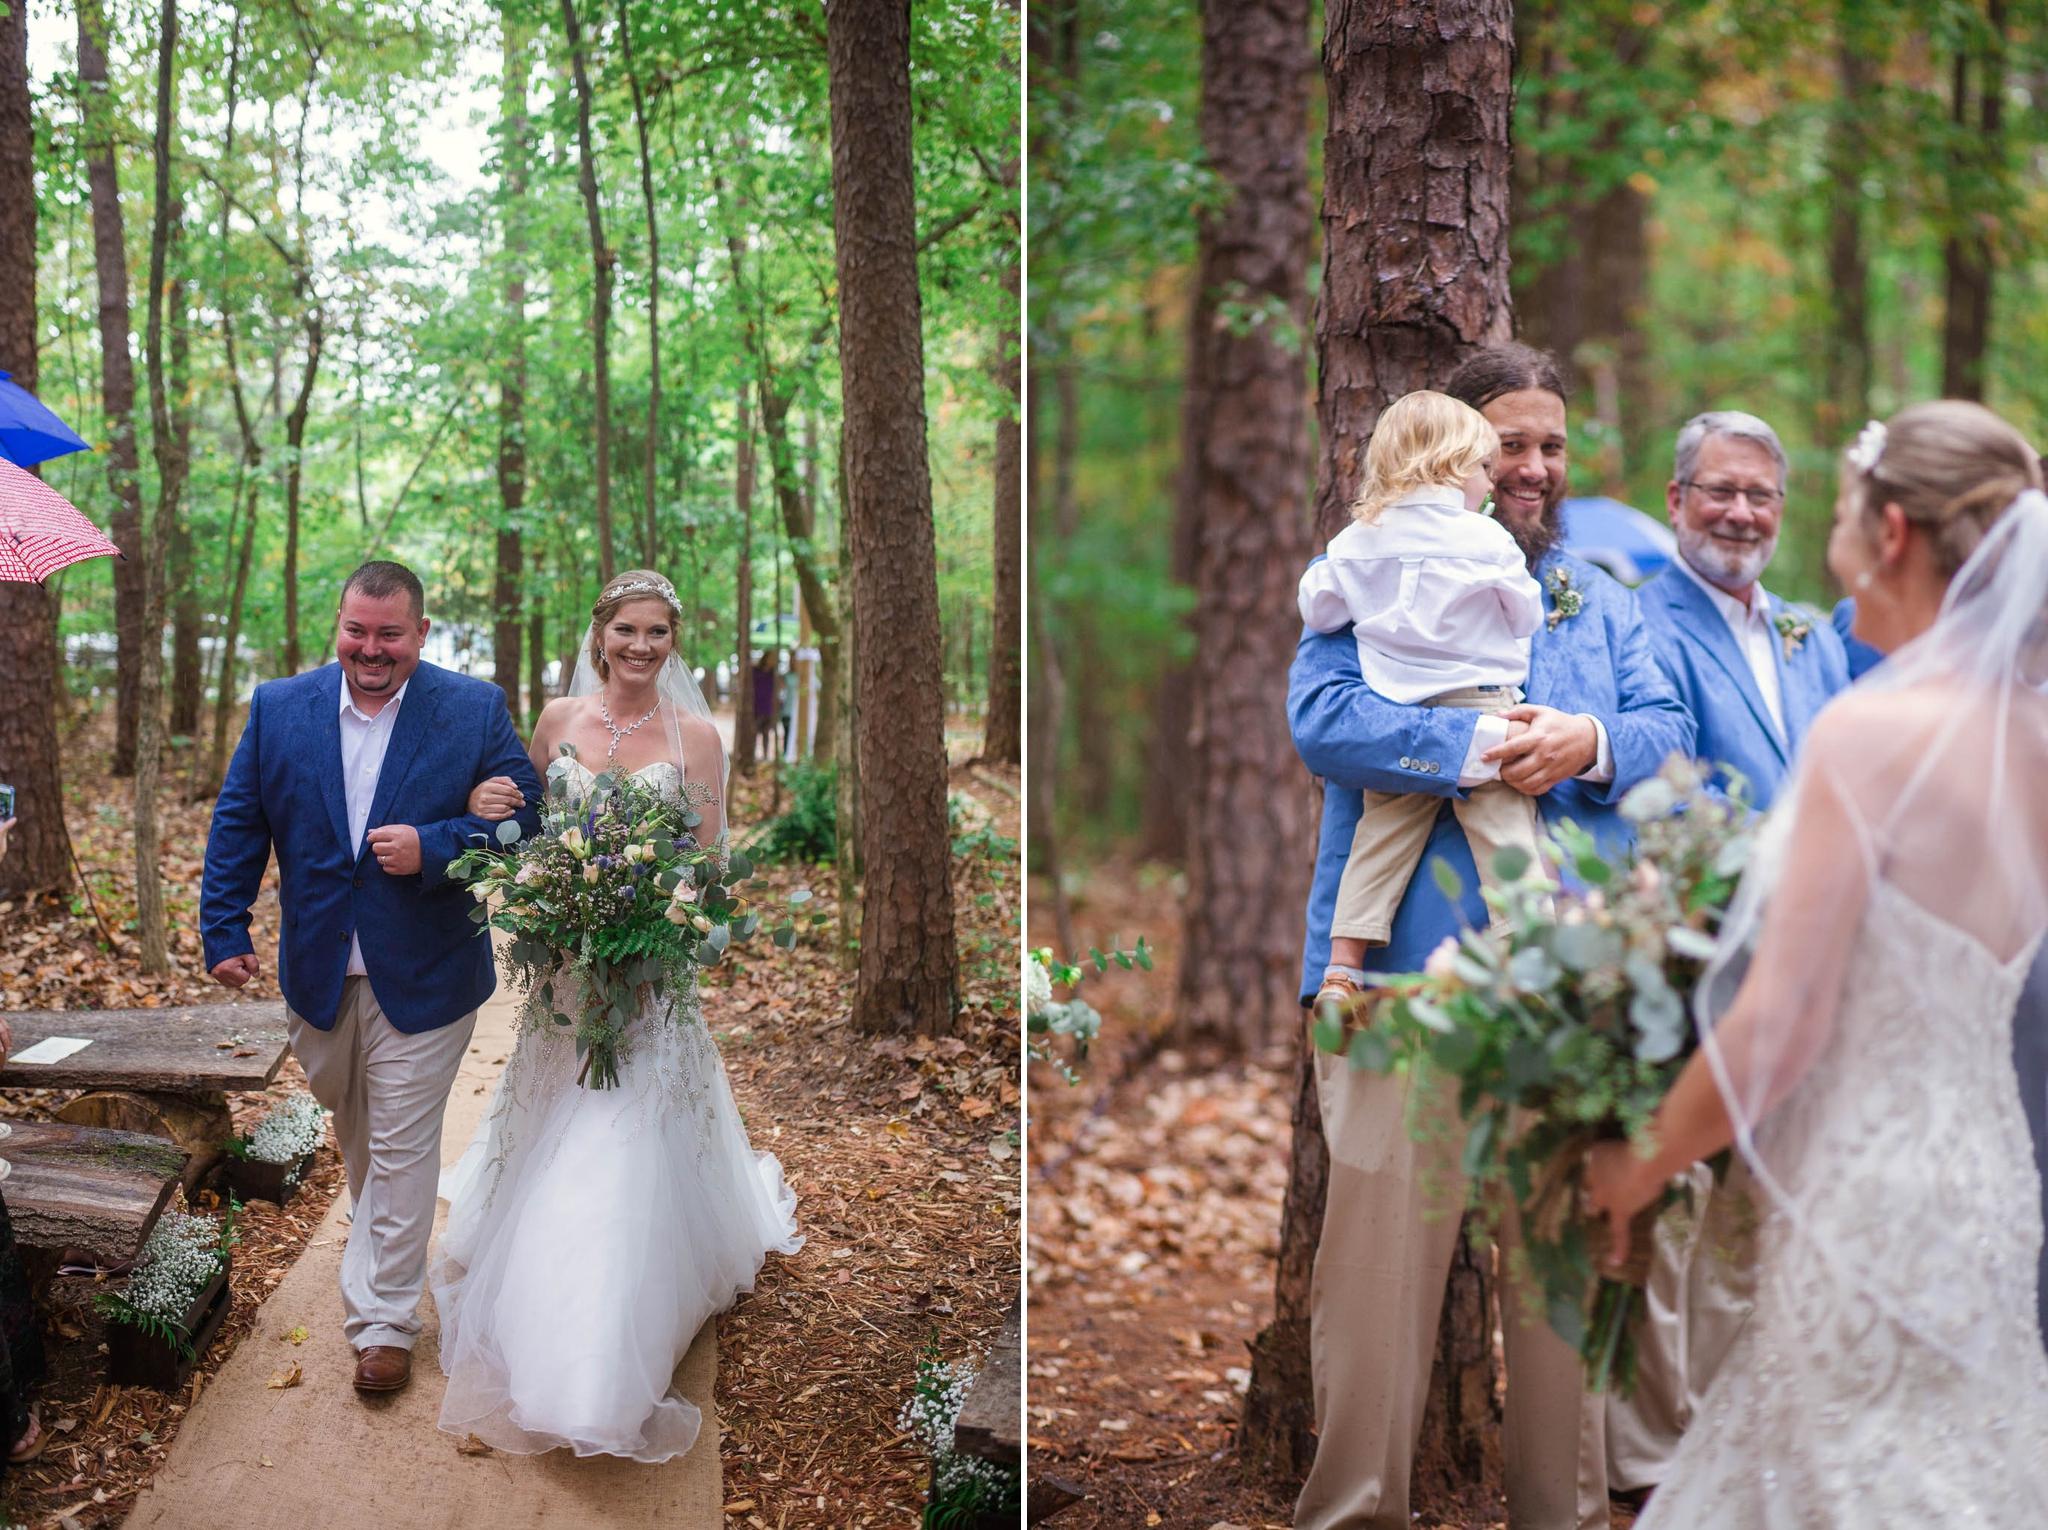 Erik + Meghan - Wedding at the Timerlake Earth Sanctuary in Whitsett North Carolina - Raleigh Wedding Photographer